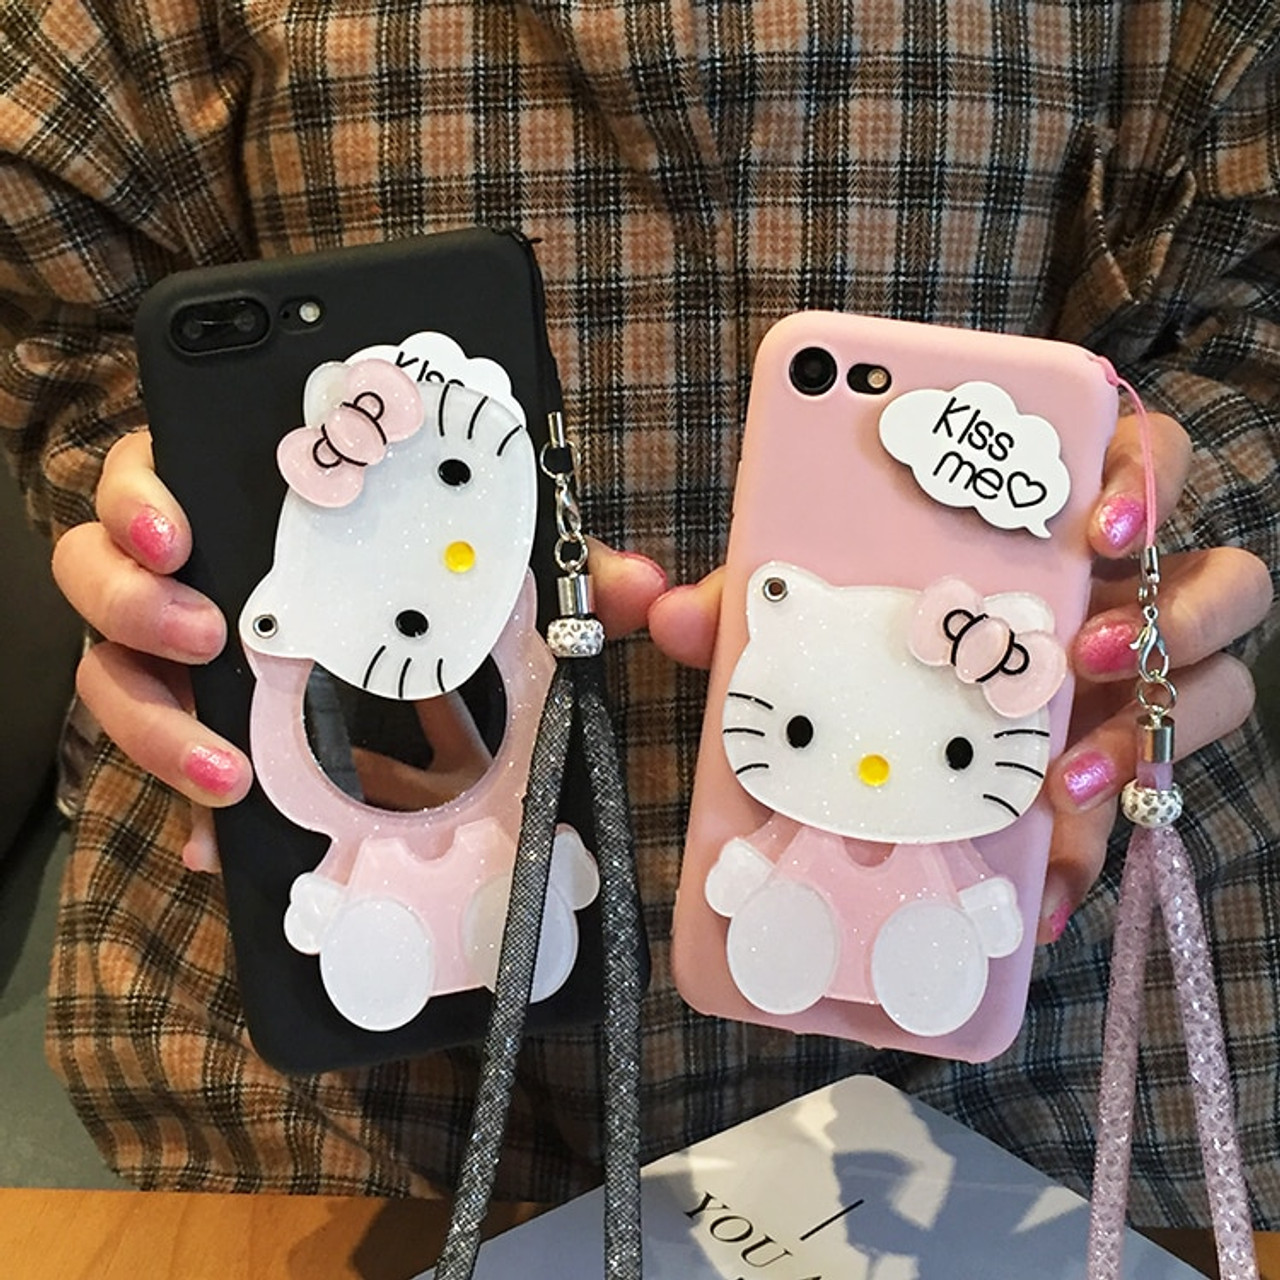 afbf19dbf For samsung galaxy note 9 Mirror case Cartoon Hello Kitty Soft Phone Cases  For SAM s9 ...